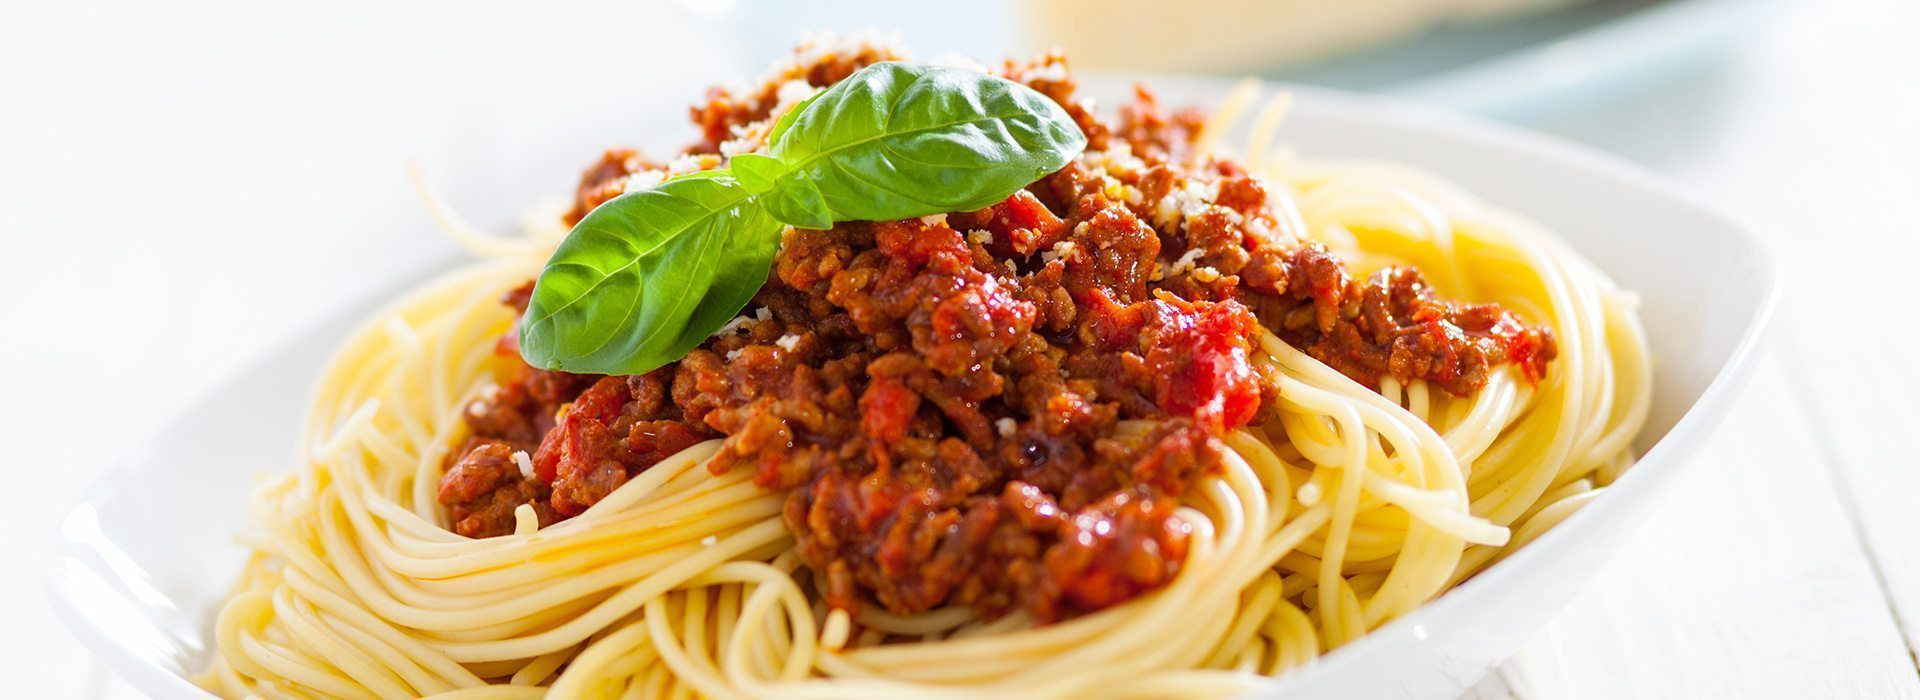 Sauce spaghetti à la viande - Recette Berthelet